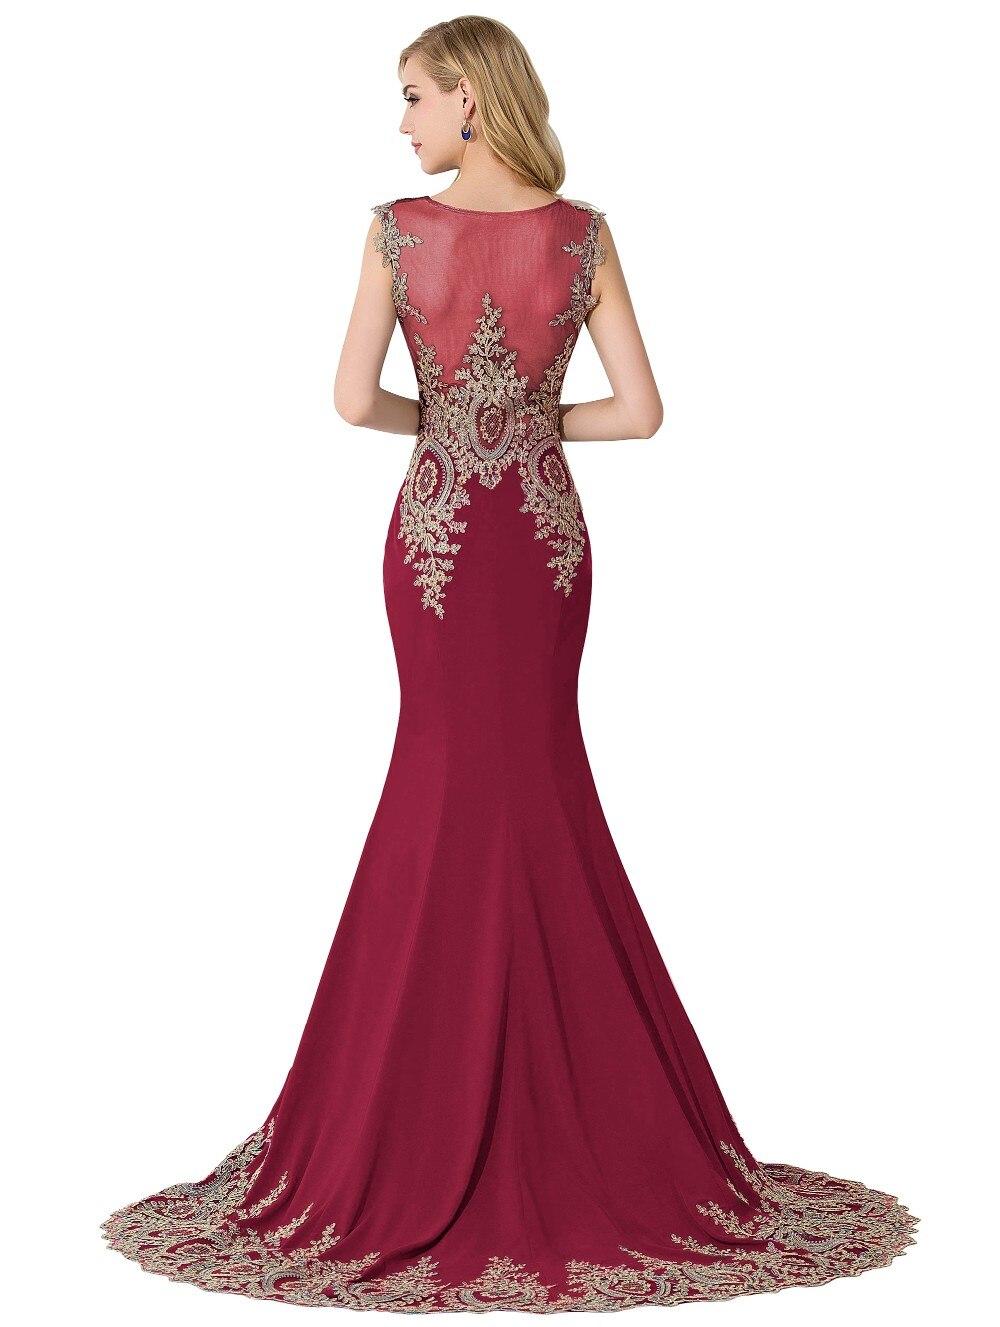 Sexy Sheer Lace Mermaid Long Prom Dresses under 50 Elegant Royal Blue Evening Party Dresses Vestido de Festa Longo